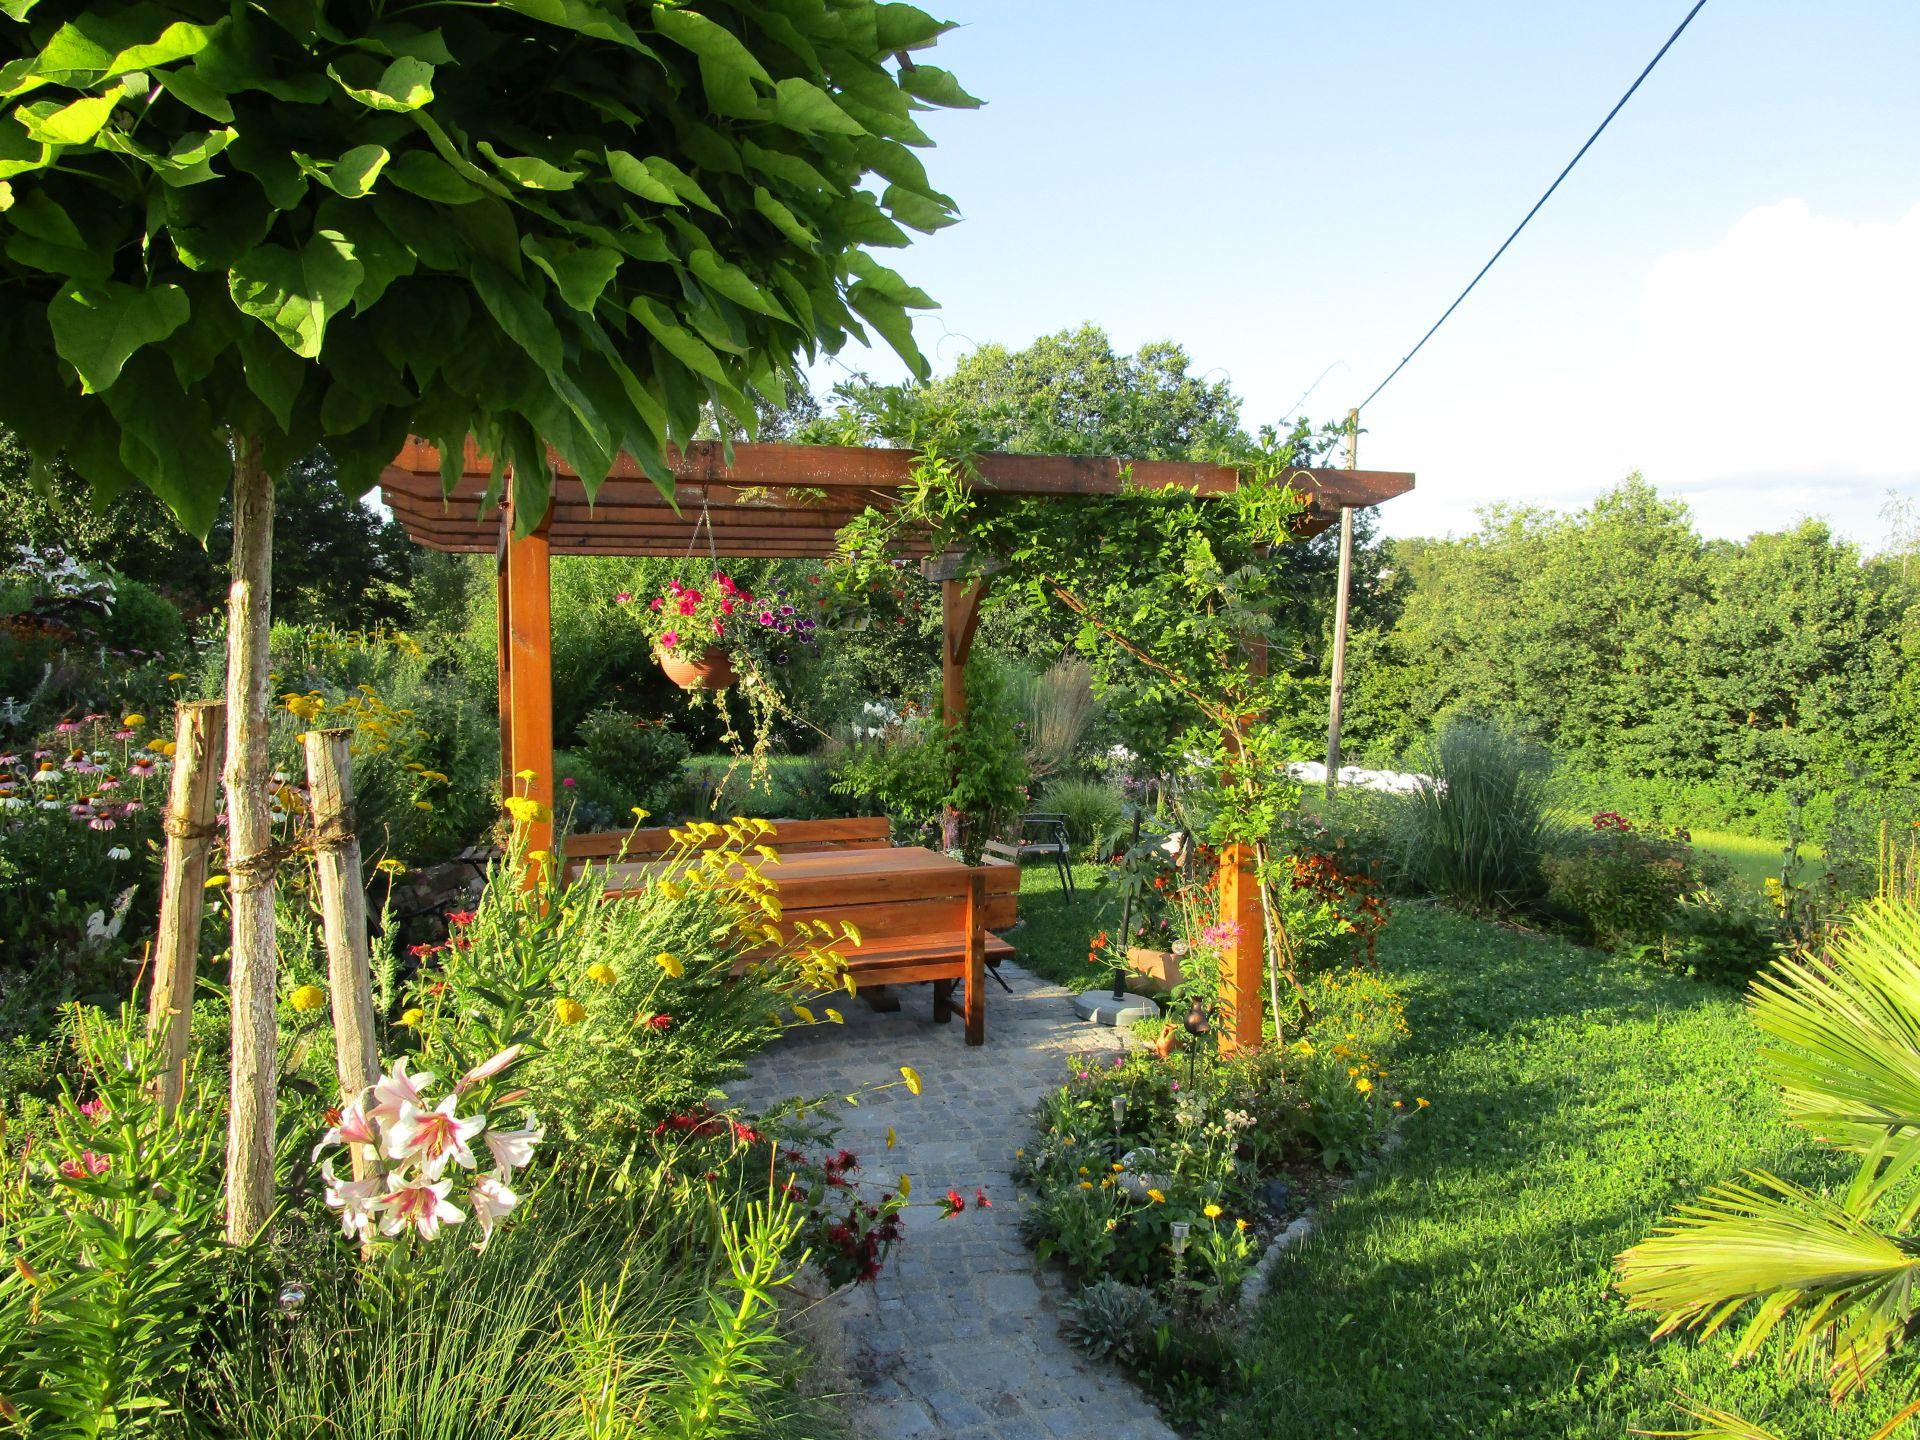 Galerie eolas gartengestaltung - Gartengestaltung pergola ...